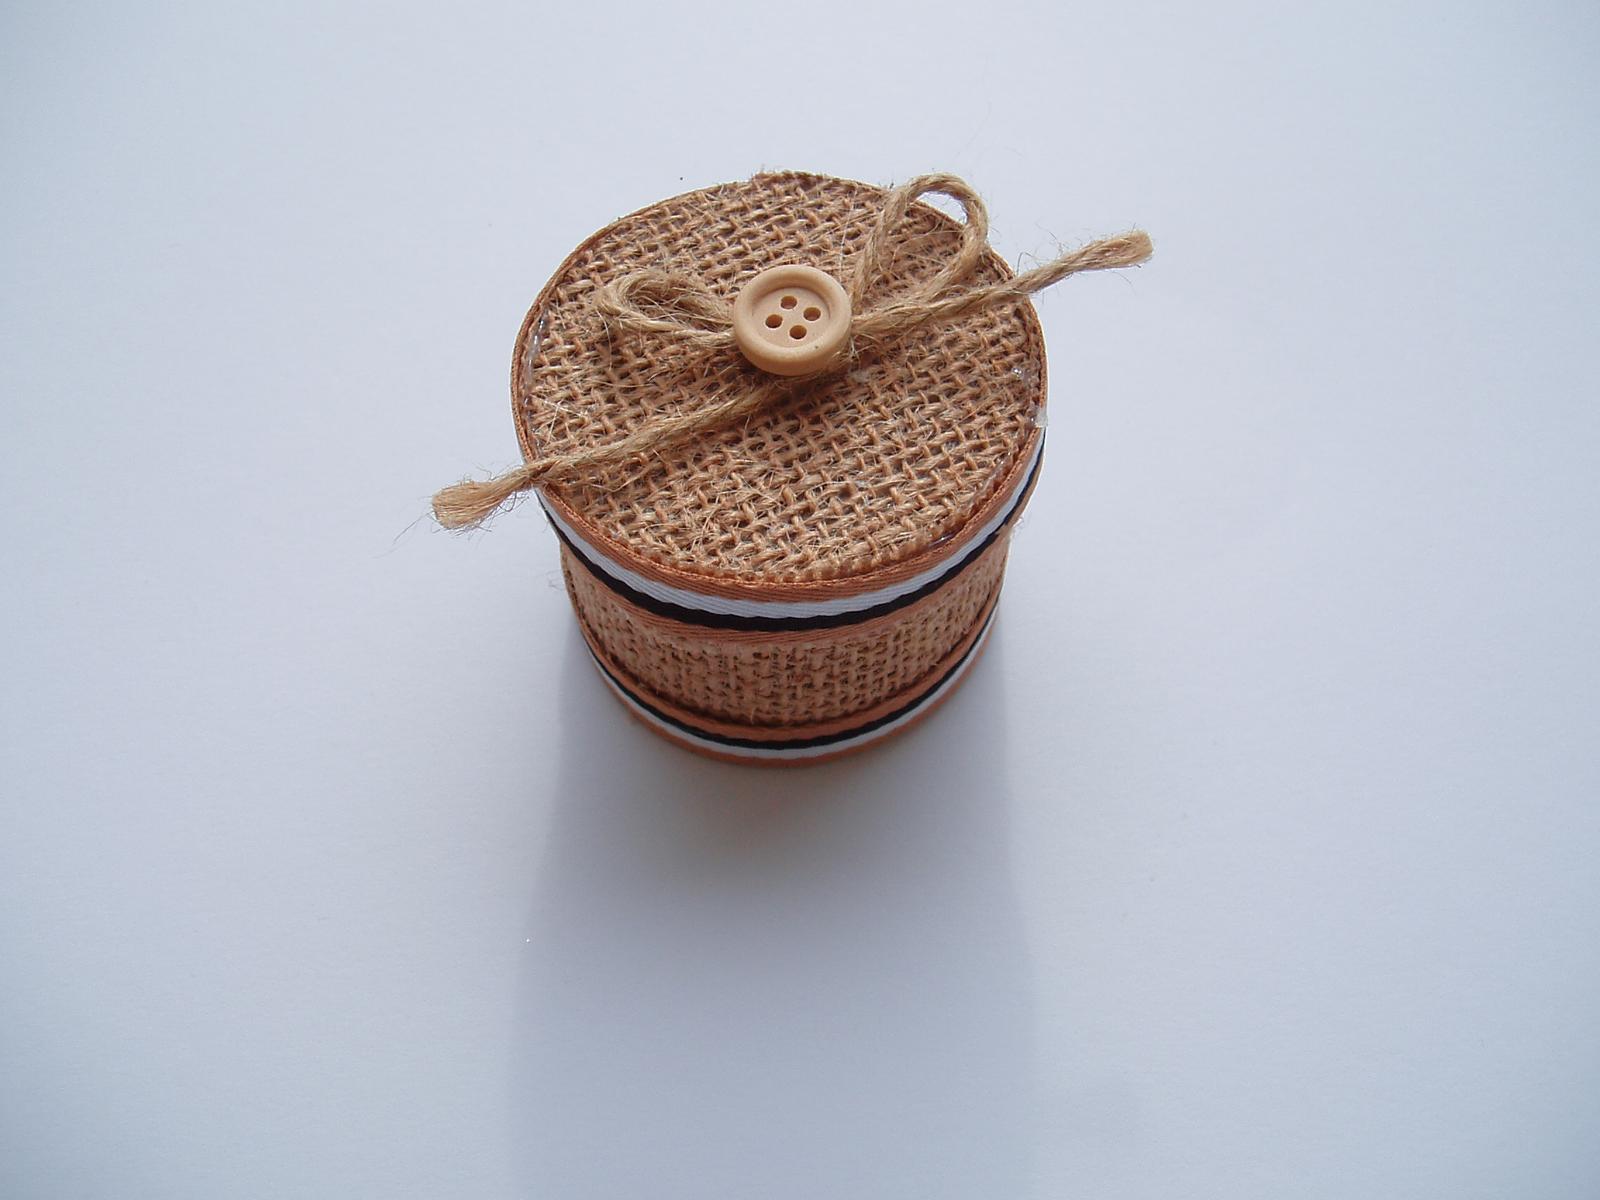 jutová krabička - Obrázek č. 2